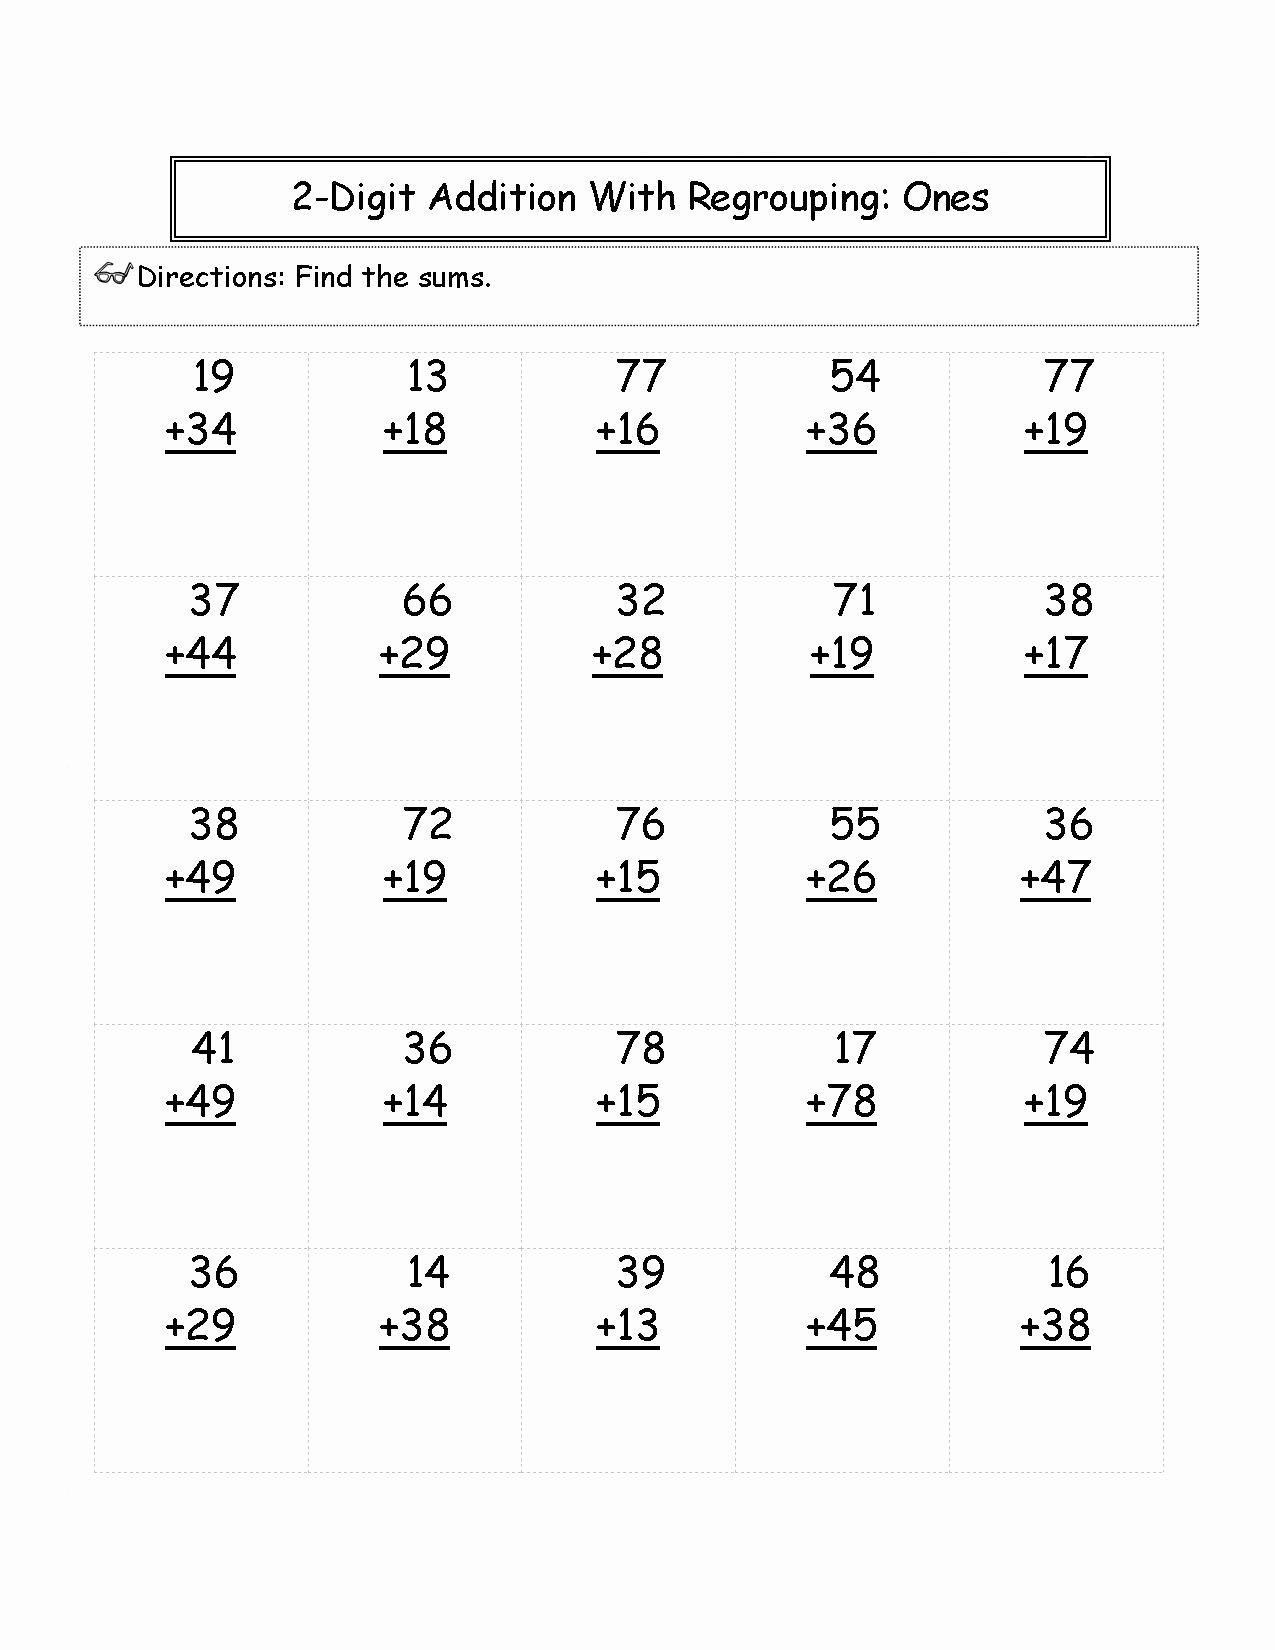 Math Mountain Worksheets 2nd Grade Inspirational 2nd Grade Math Worksheets Best Coloring Pages for Kids